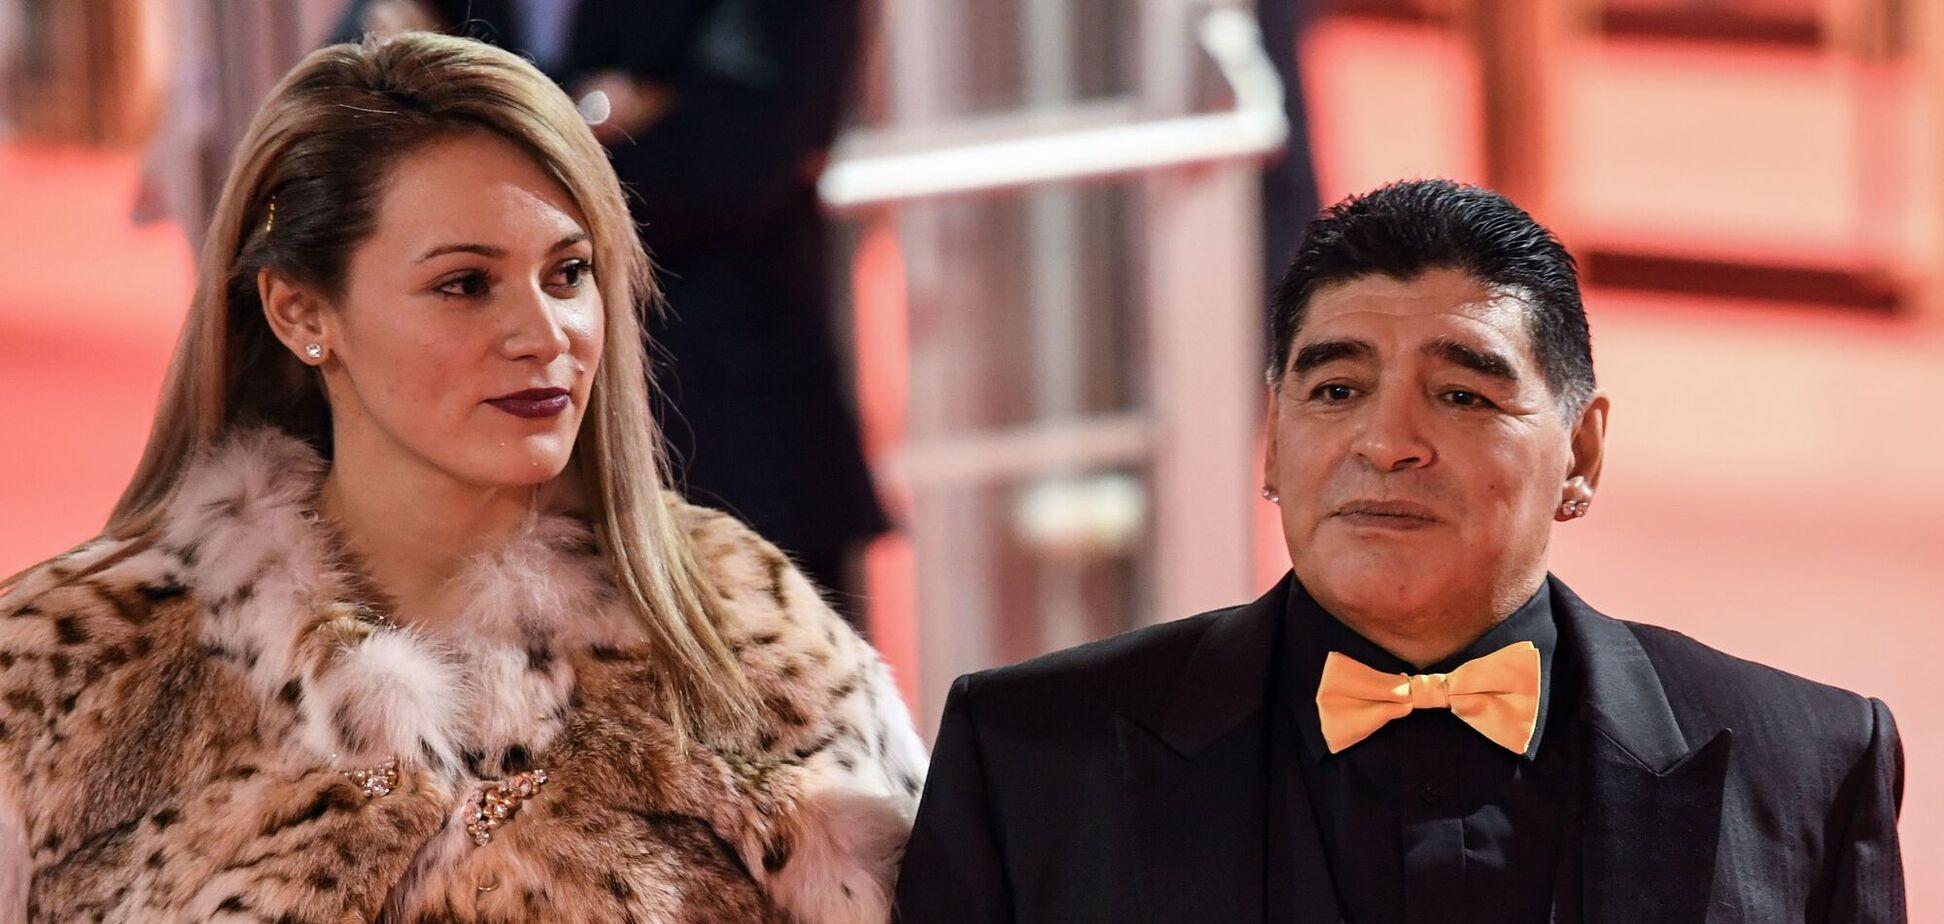 Диего Марадона с молодой избранницей Росио Оливе